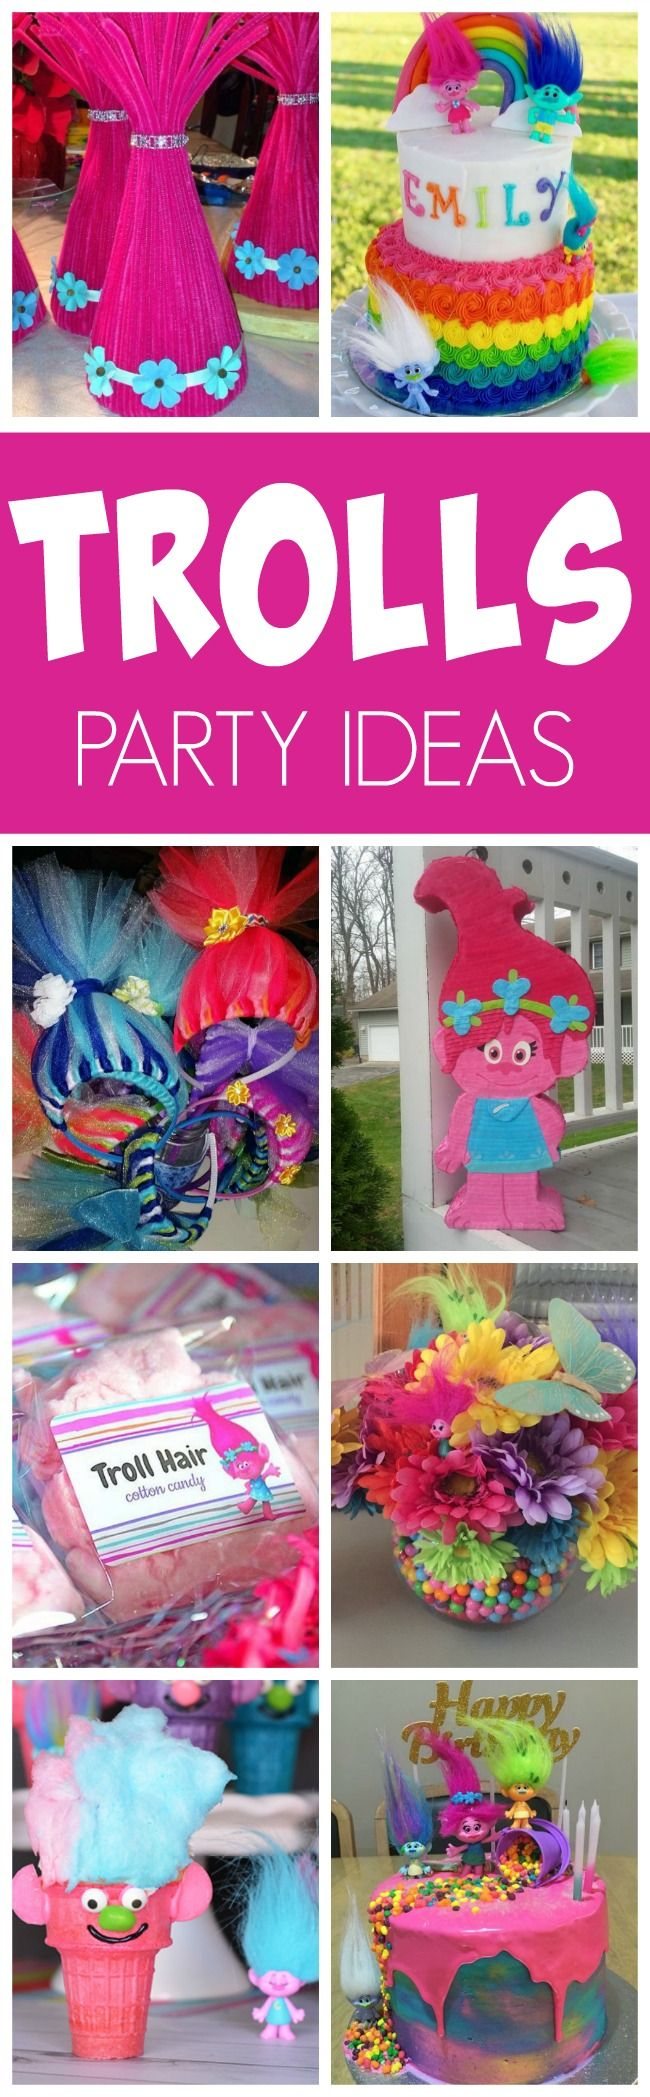 20 Terrific Trolls Party Ideas   Pretty My Party